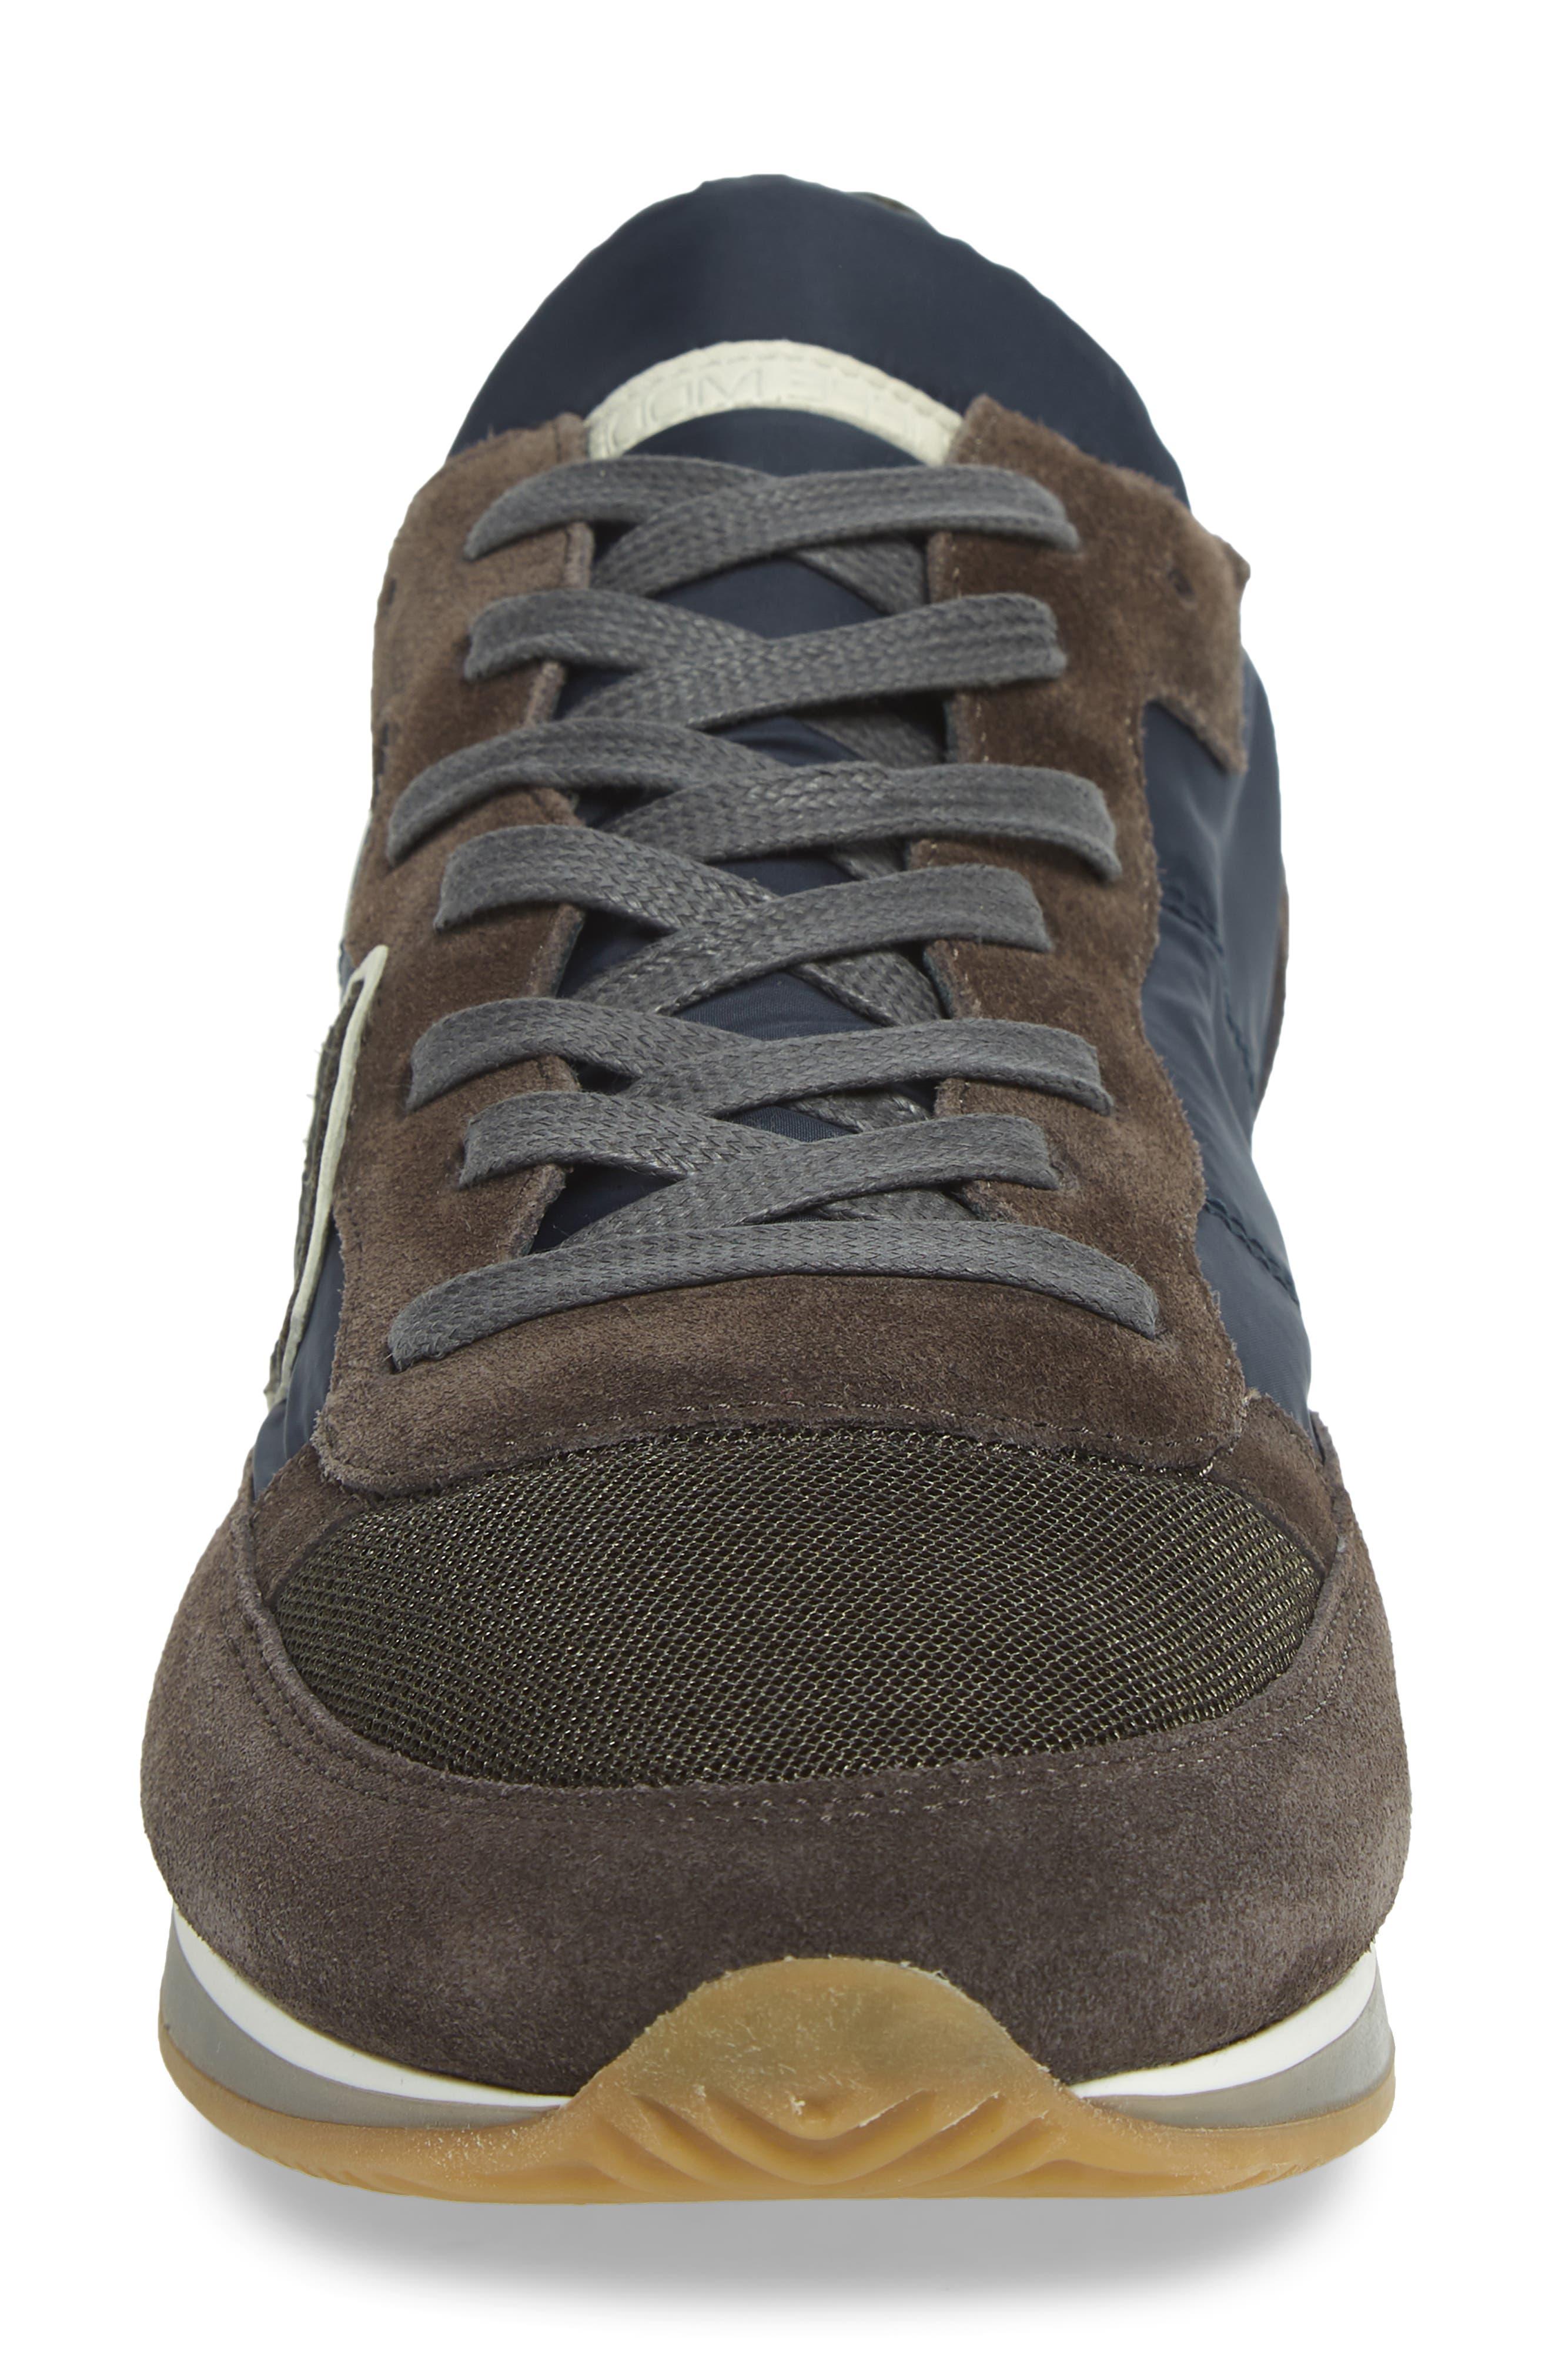 Tropez Low Top Sneaker,                             Alternate thumbnail 4, color,                             020